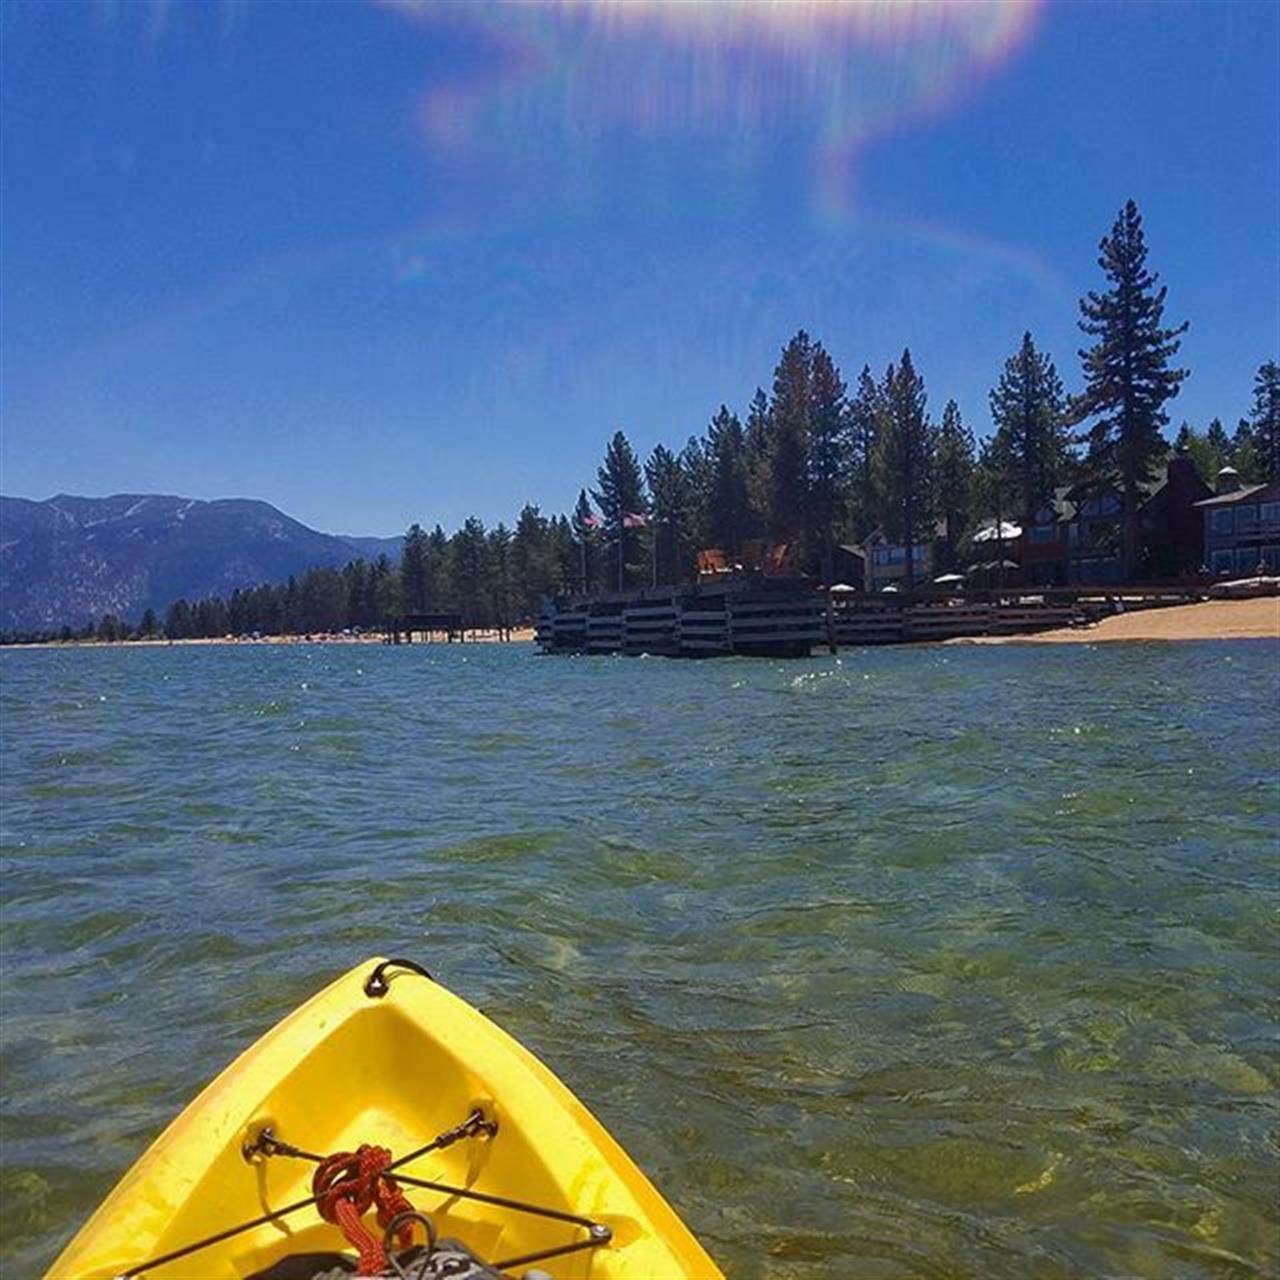 Lake Tahoe. Your daily adventures still impress me. I love living in Lake Tahoe! #southlaketahoe